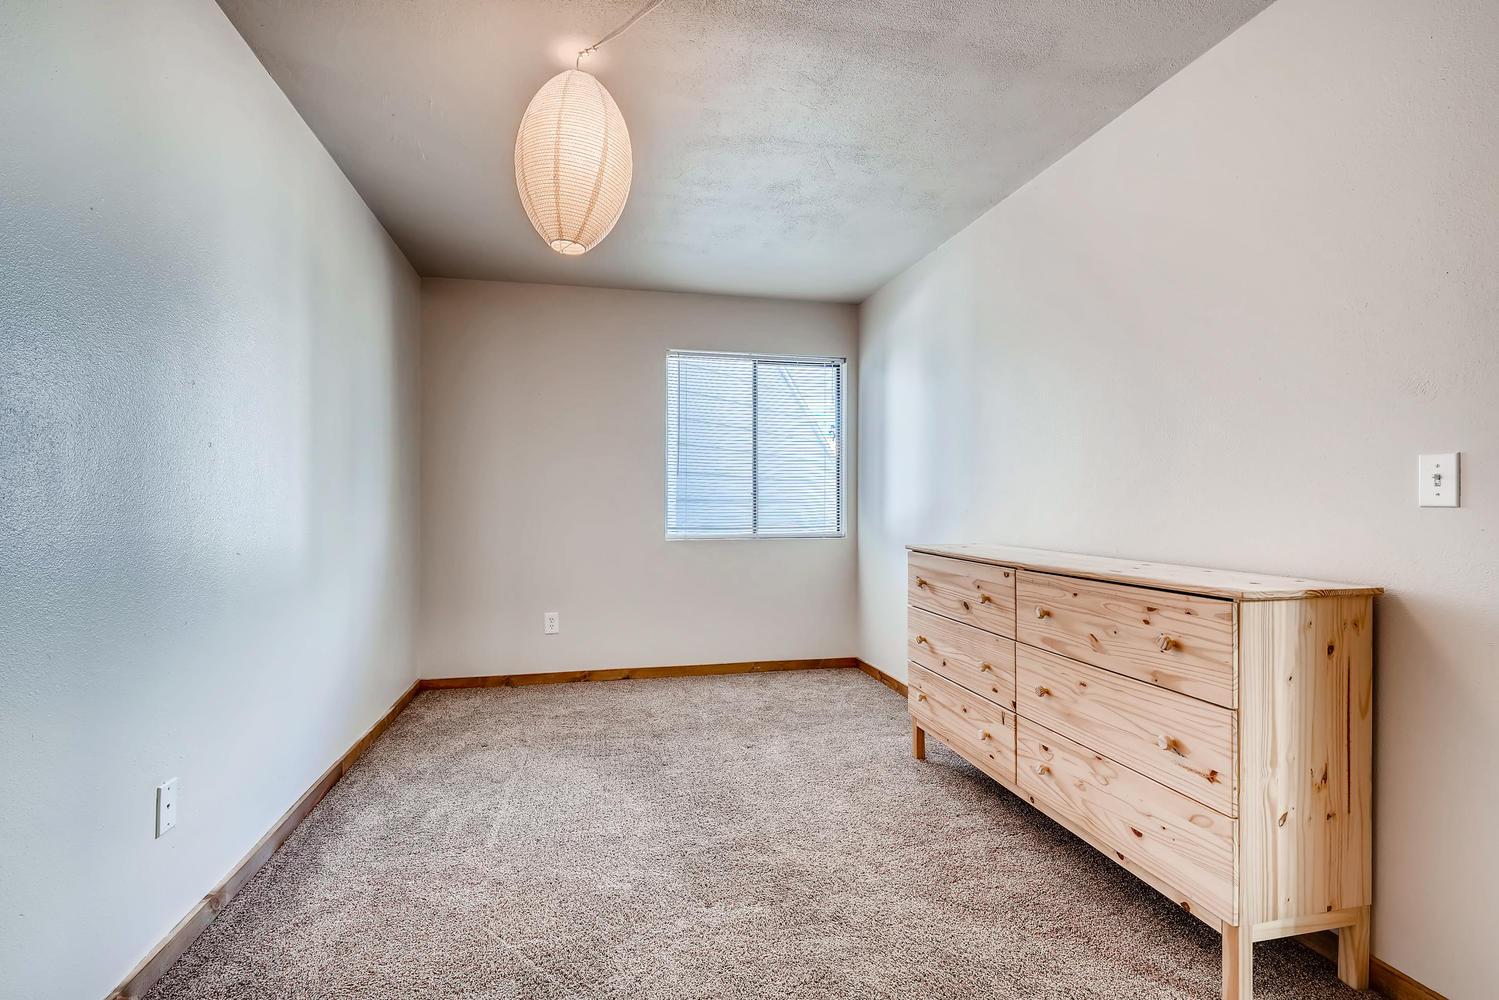 12478 W Nevada Pl 104 Lakewood-large-017-018-Master Bedroom-1499x1000-72dpi.jpg